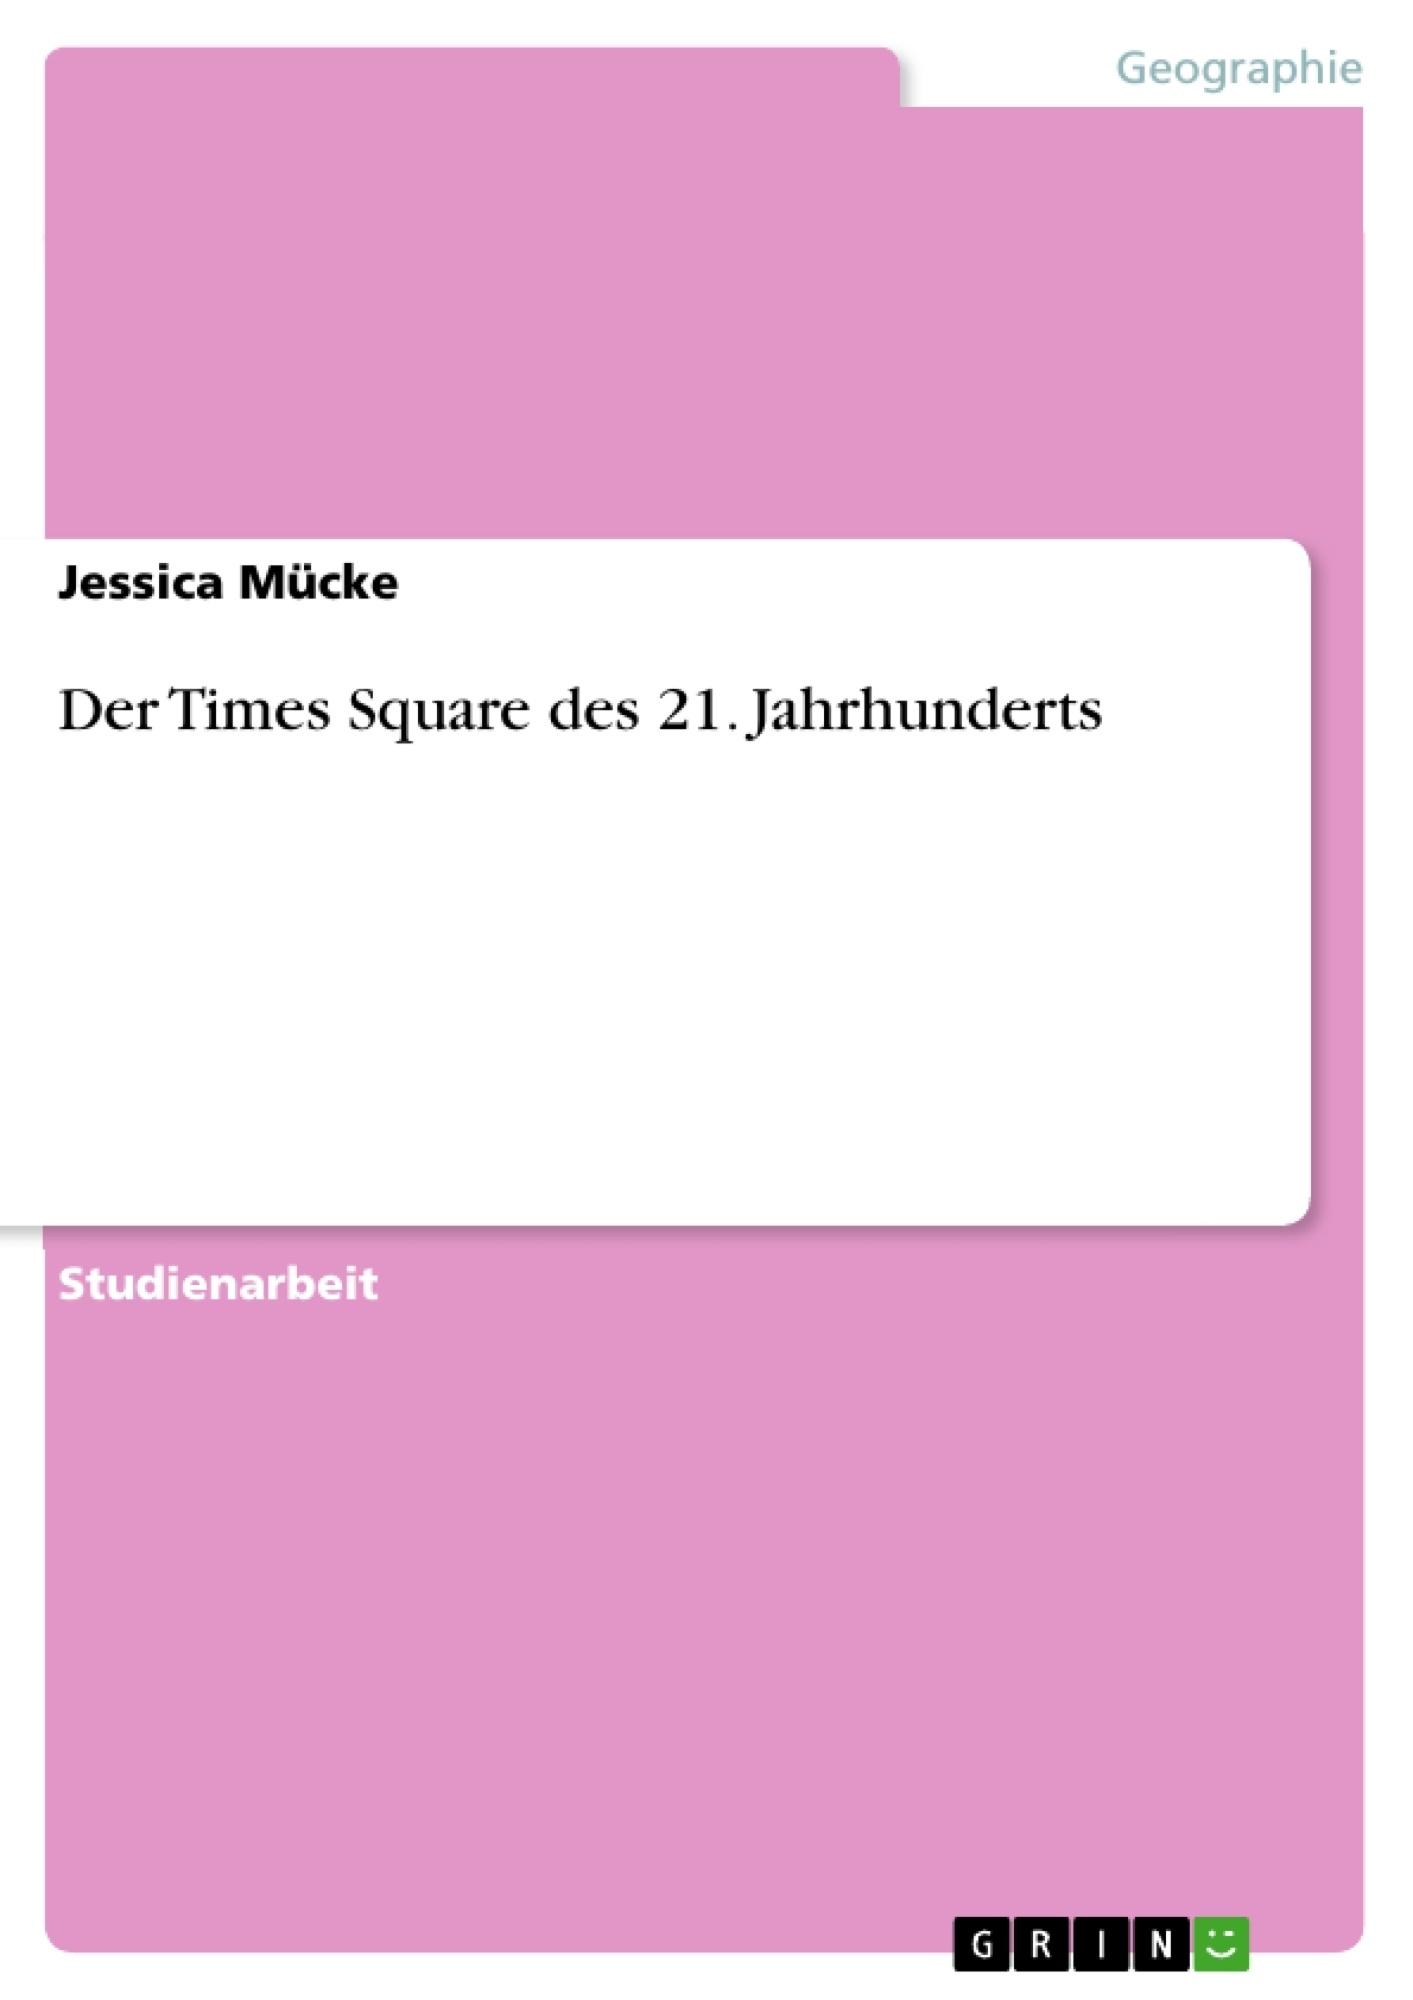 Titel: Der Times Square des 21. Jahrhunderts